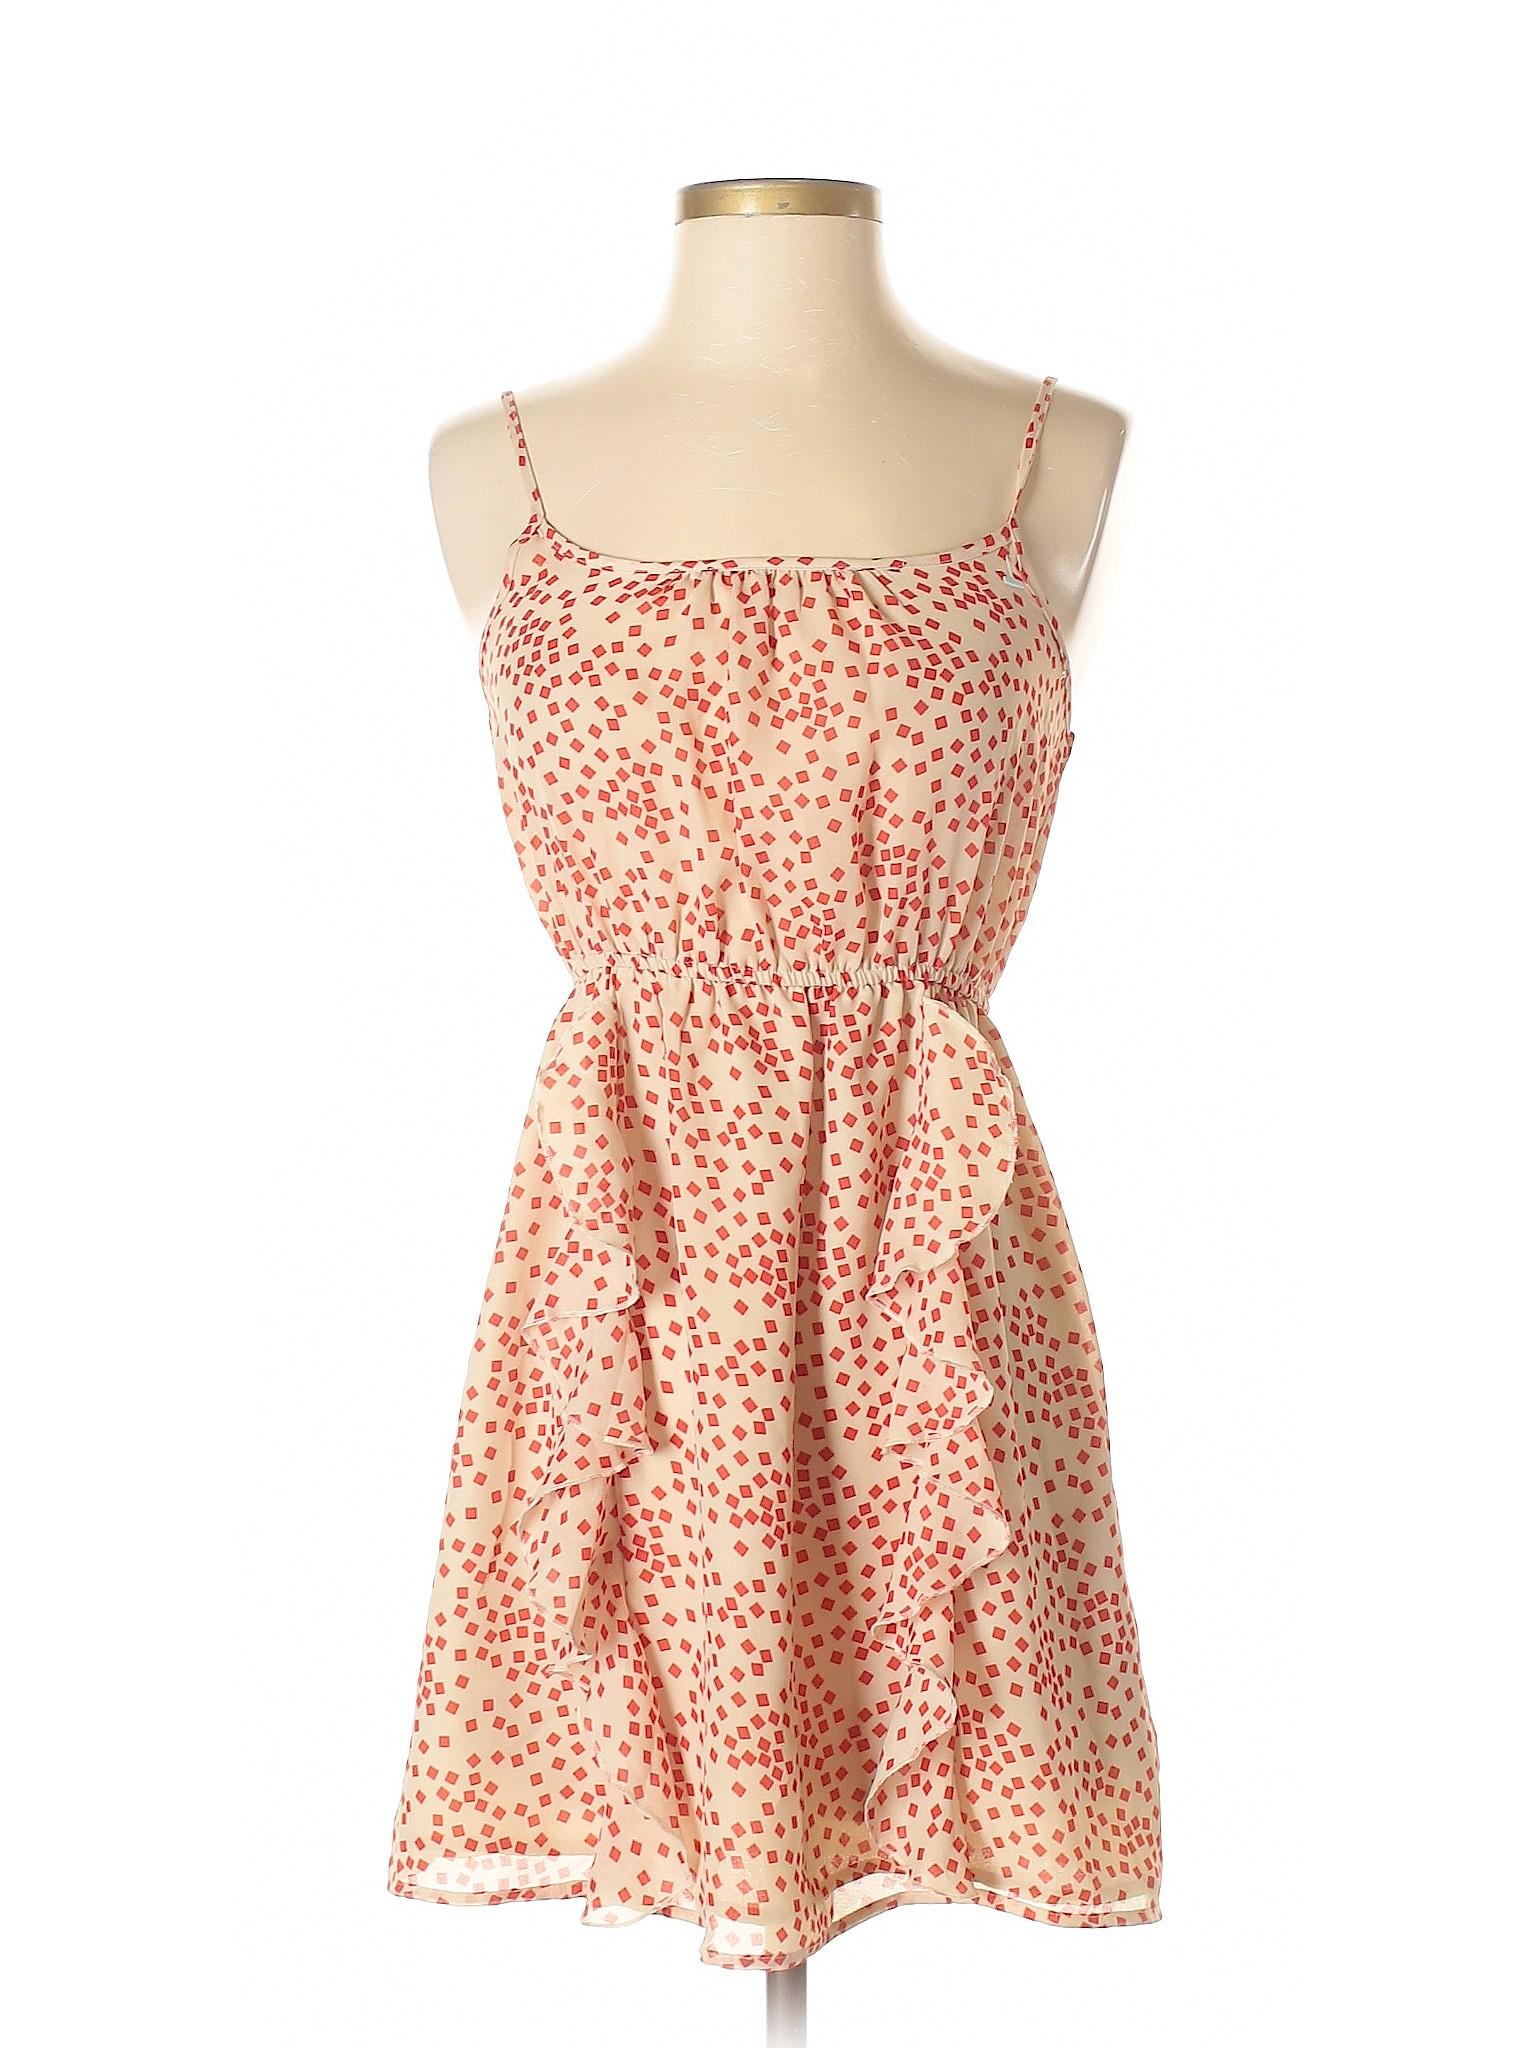 XXI Casual Boutique winter XXI Boutique Casual Dress Dress winter winter Boutique wWq8TABg